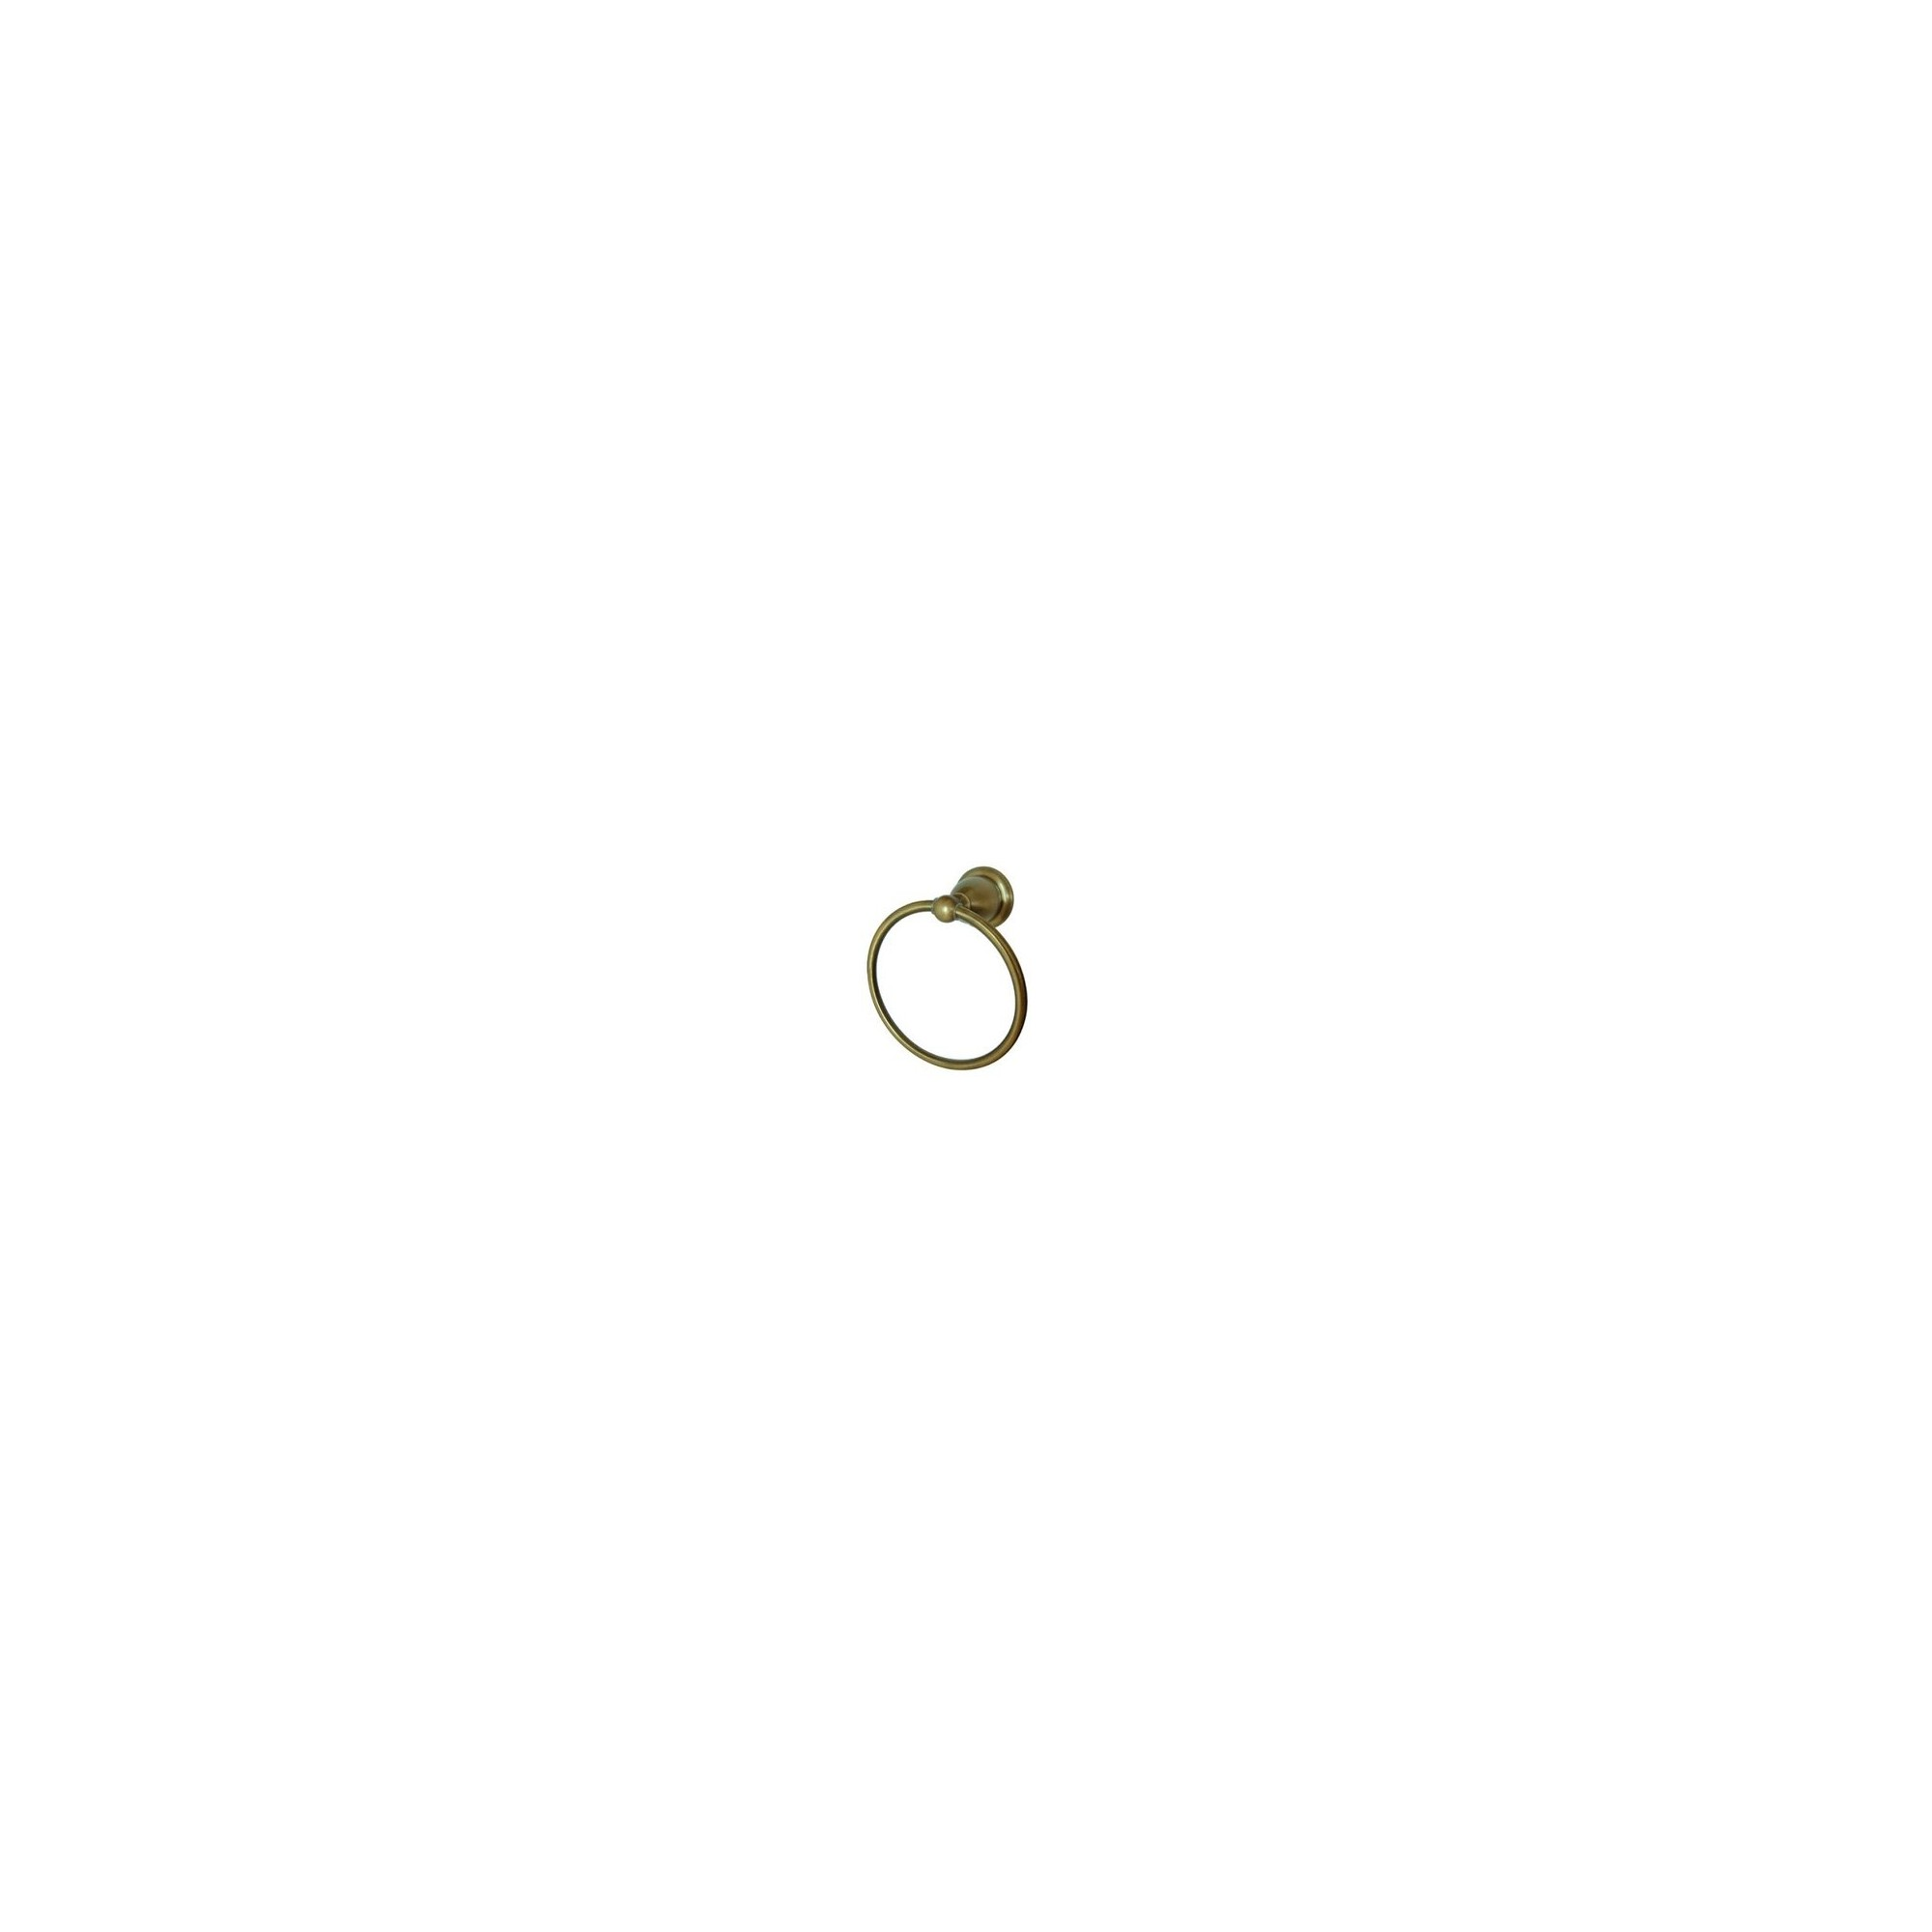 'Heritage 6'' Towel Ring Antique Brass - Kingston Brass'